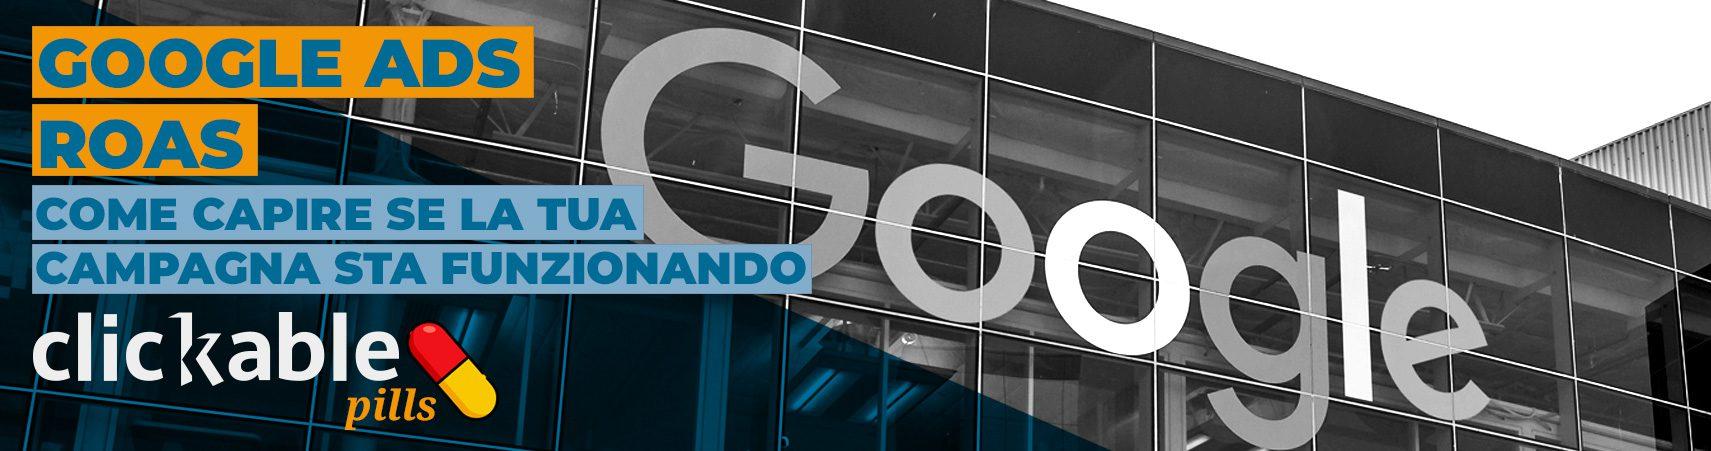 Google-AdWords-roas